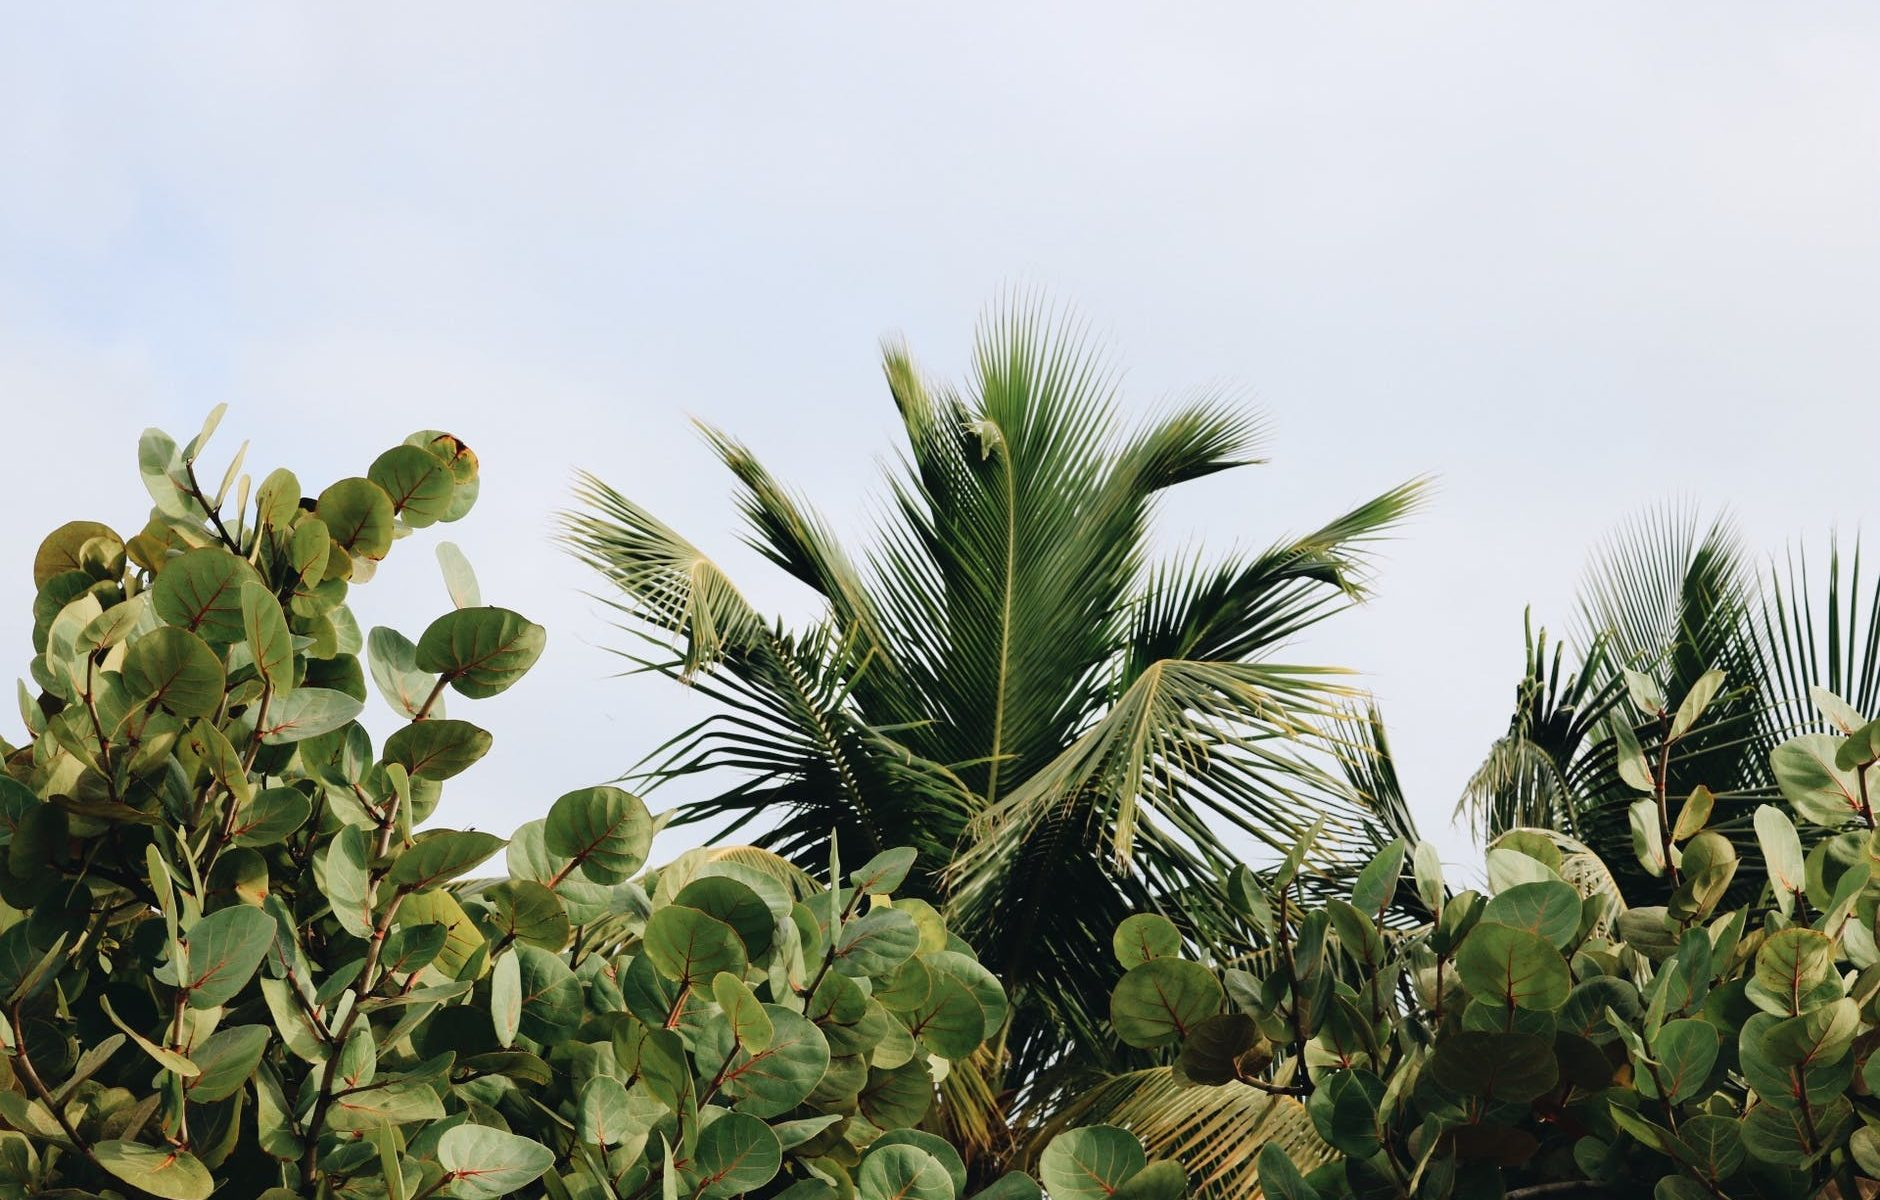 Mês de agosto © Pexels